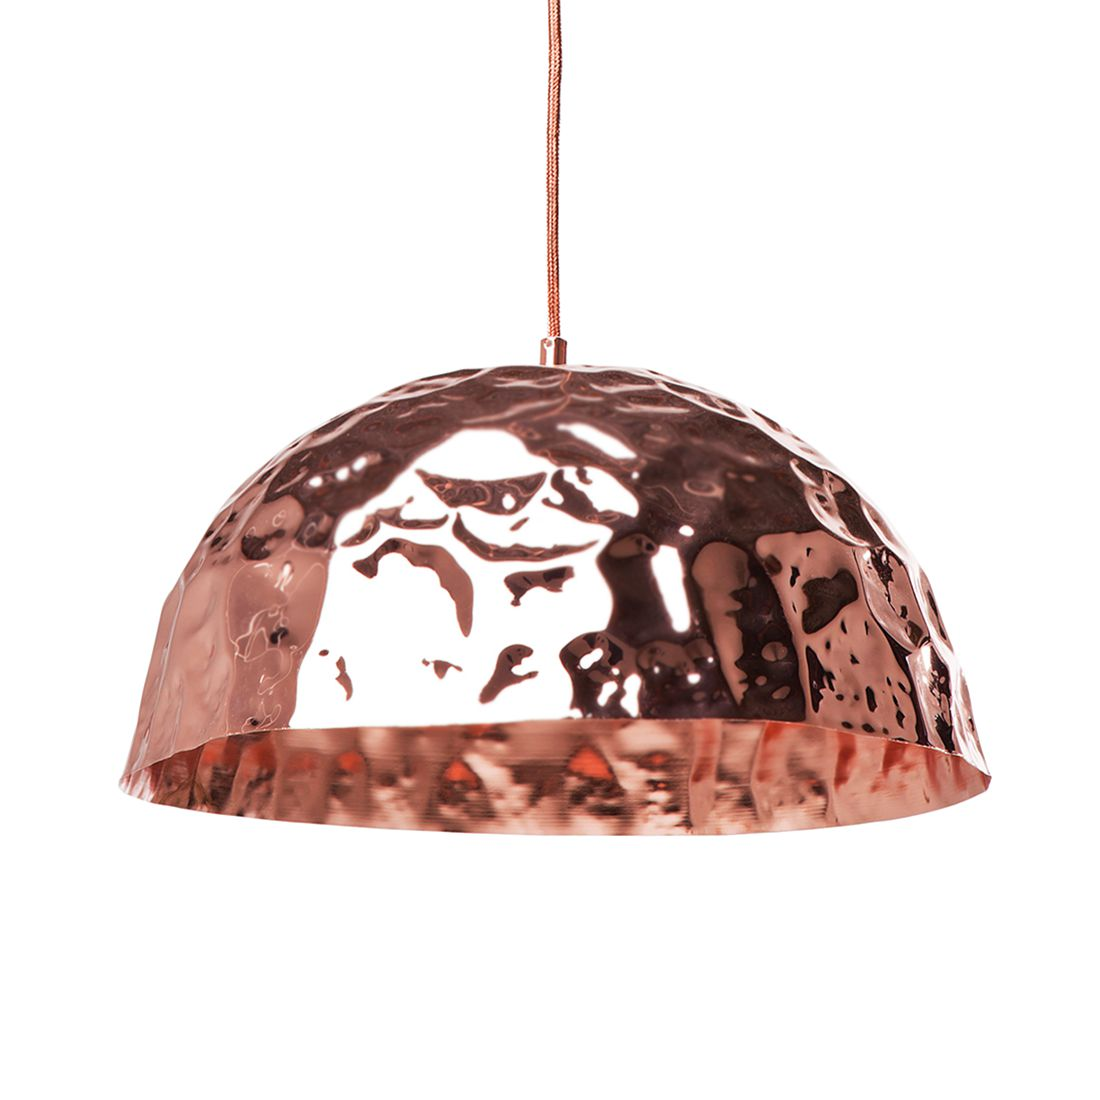 Pendelleuchte Crumble ● Metall ● Braun ● 1-flammig- Kare Design A++